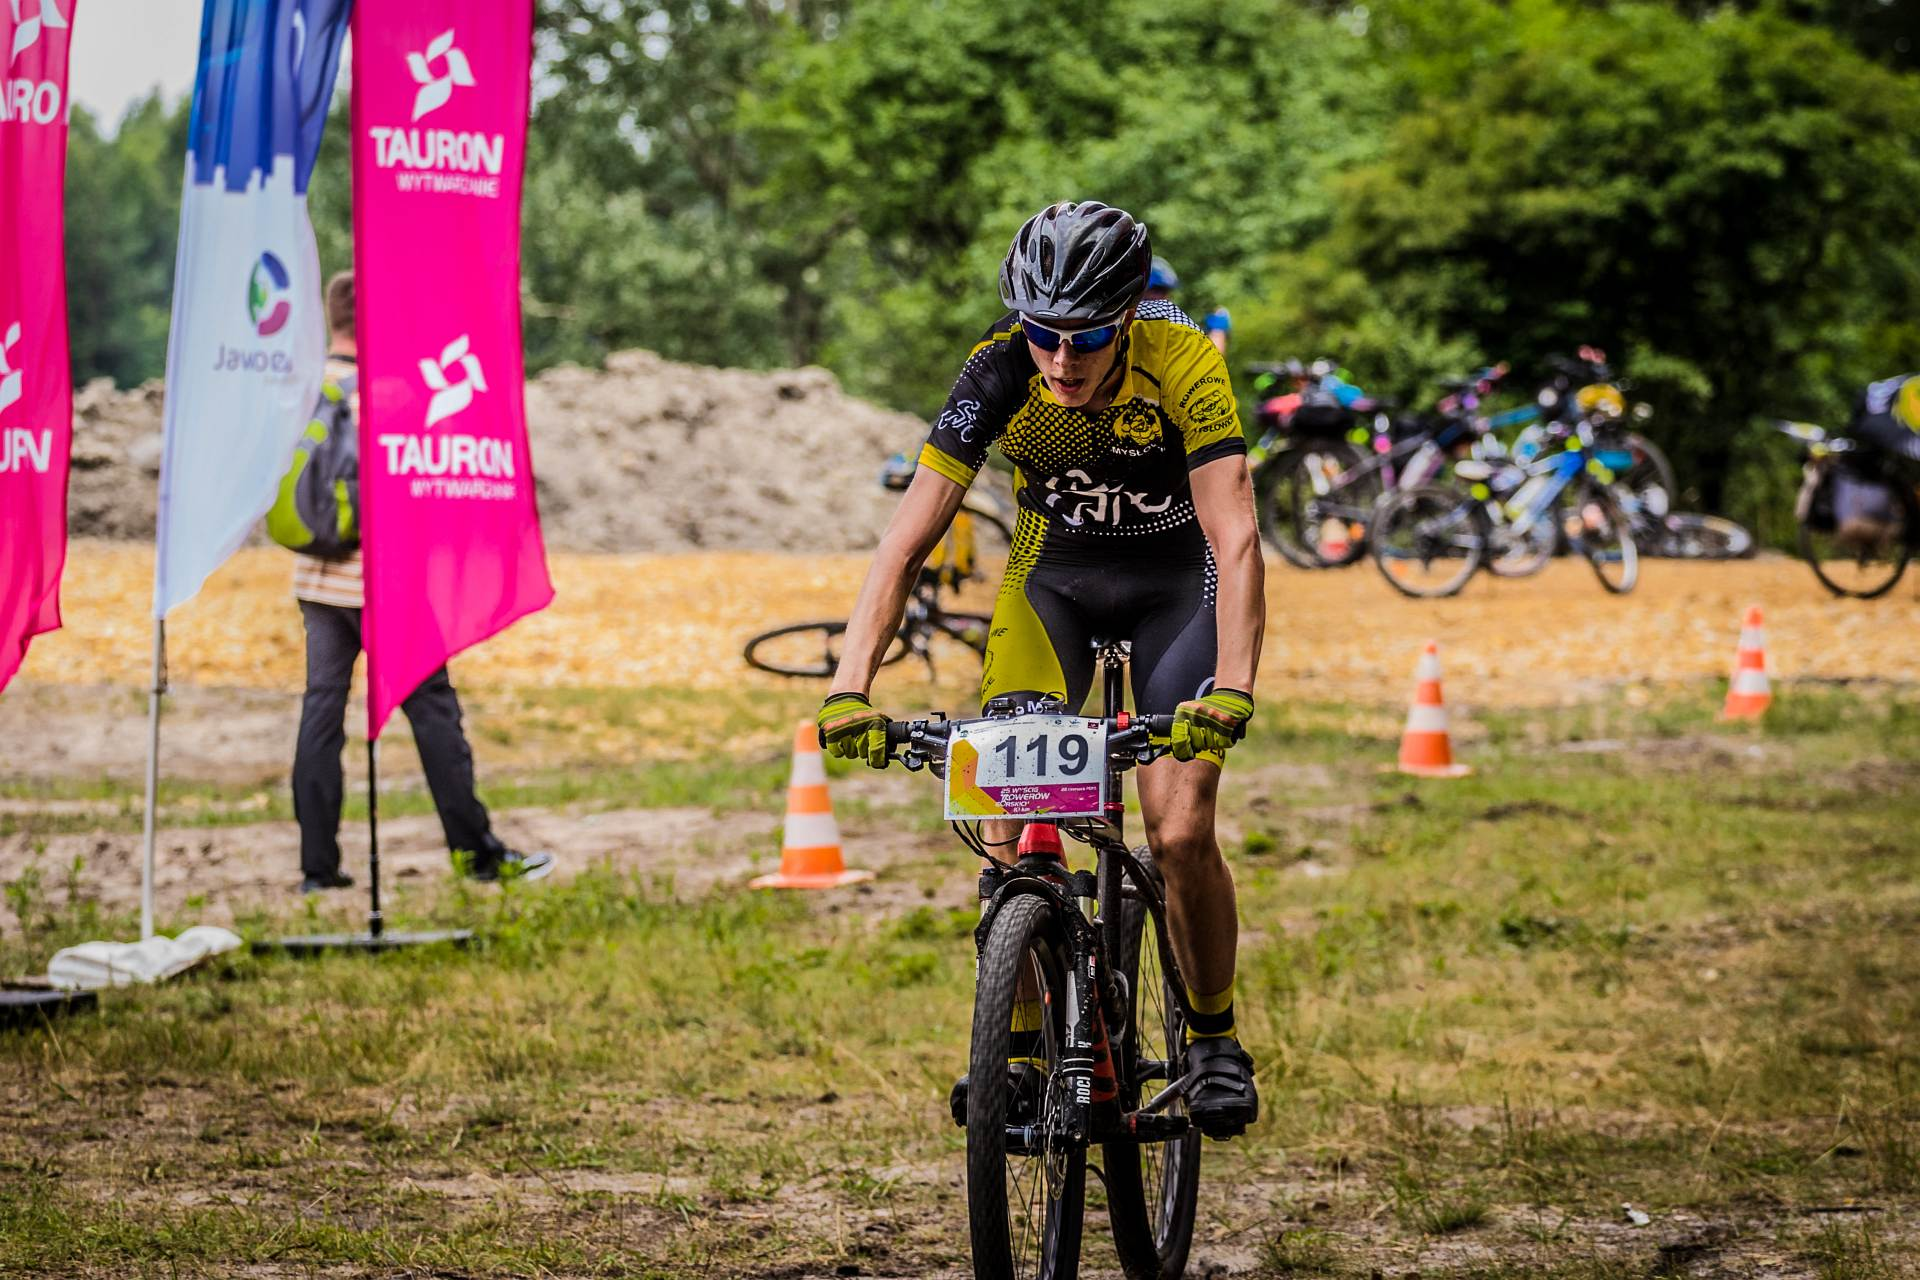 wyscig-rowerow-gorskich-0165